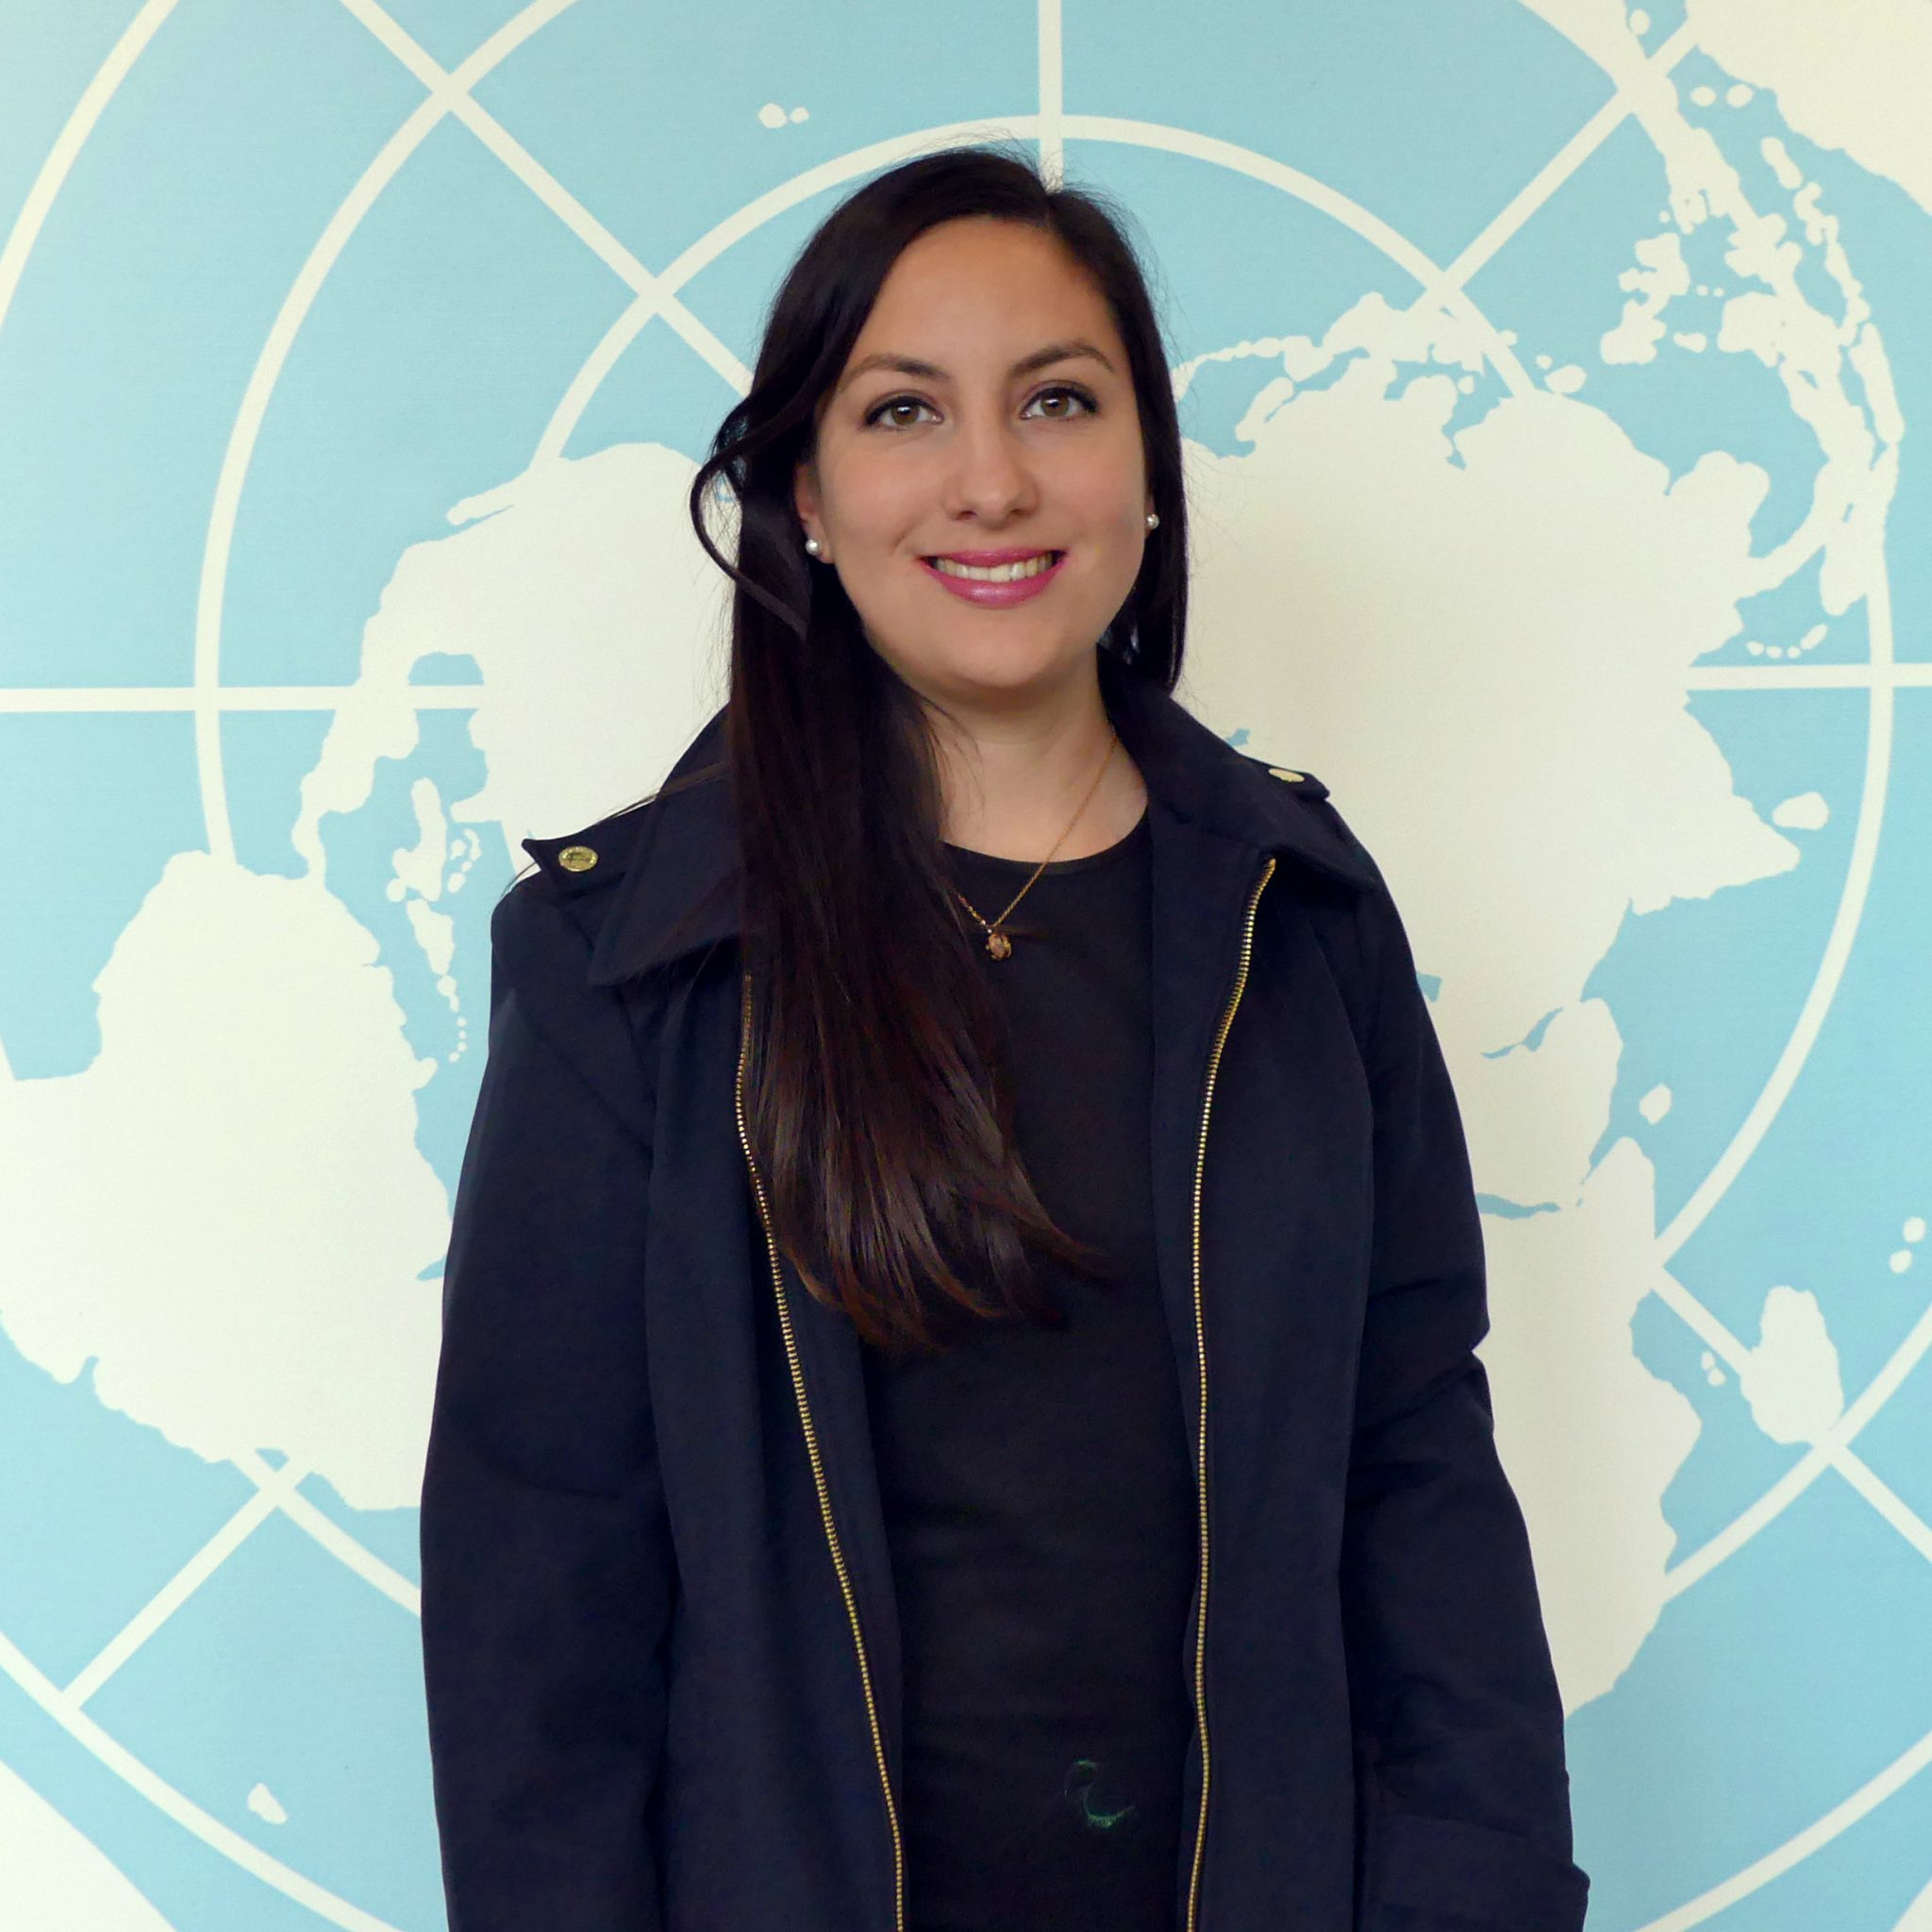 Jimena Flores